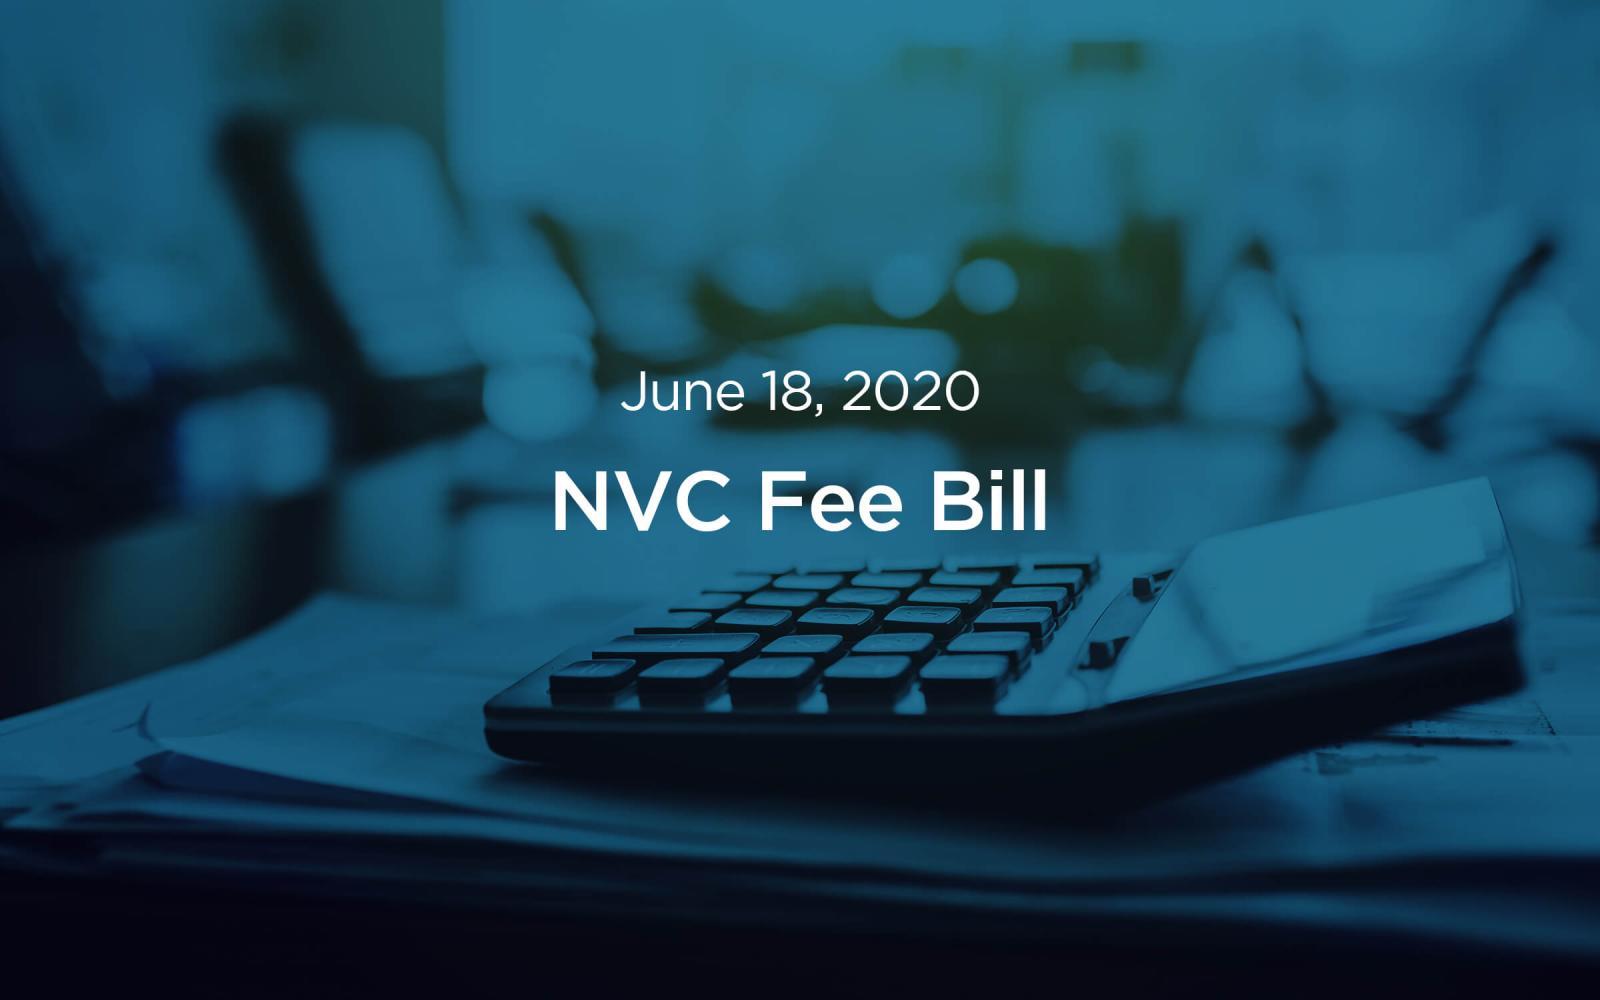 NVC fee bill